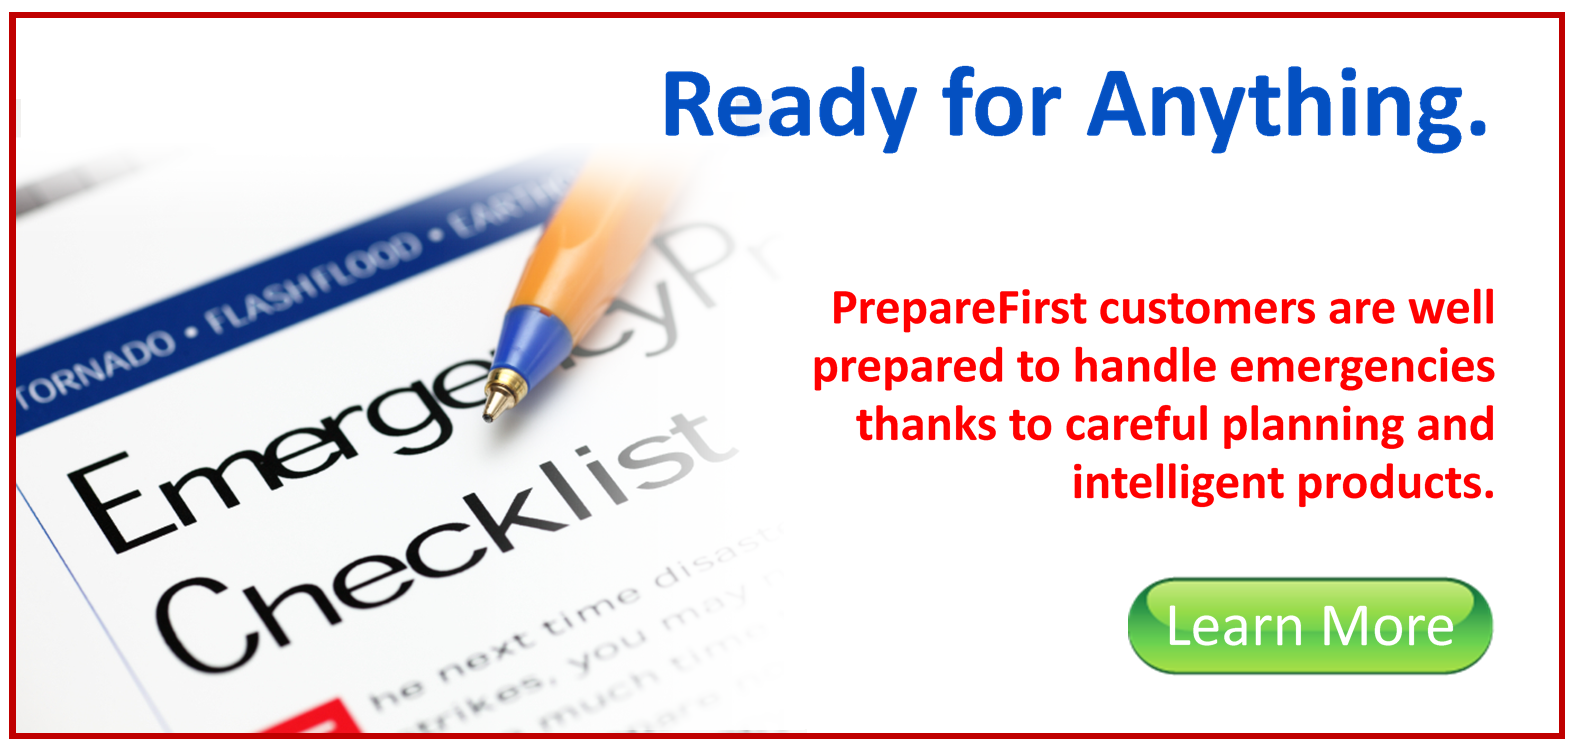 Click here for EMERGENCY PREPAREDNESS